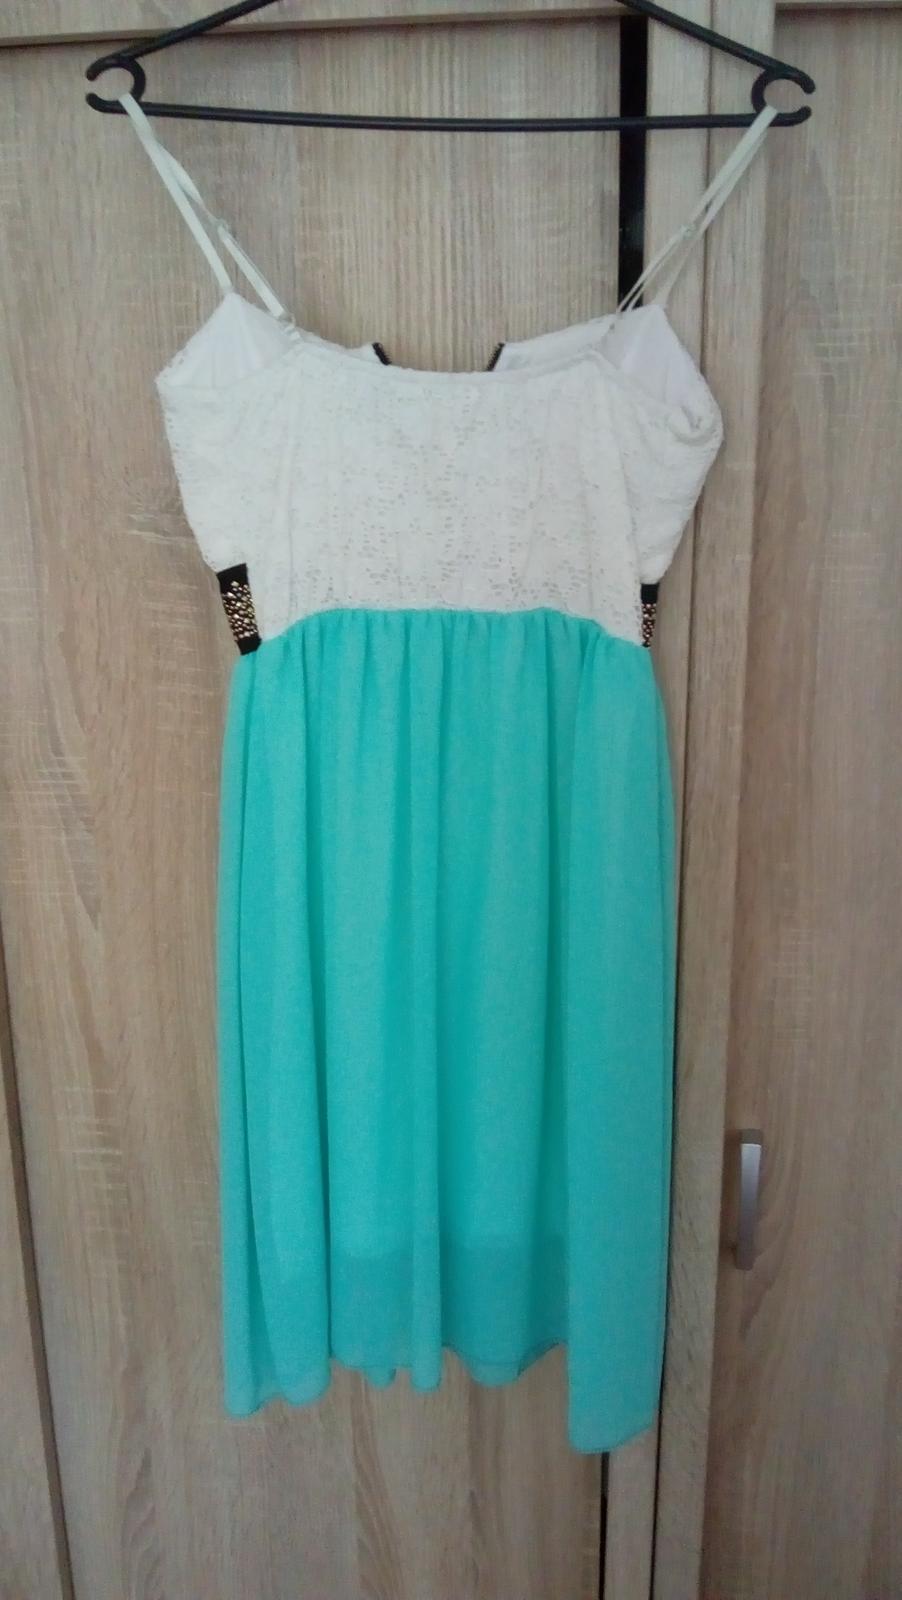 Šaty - Obrázok č. 4